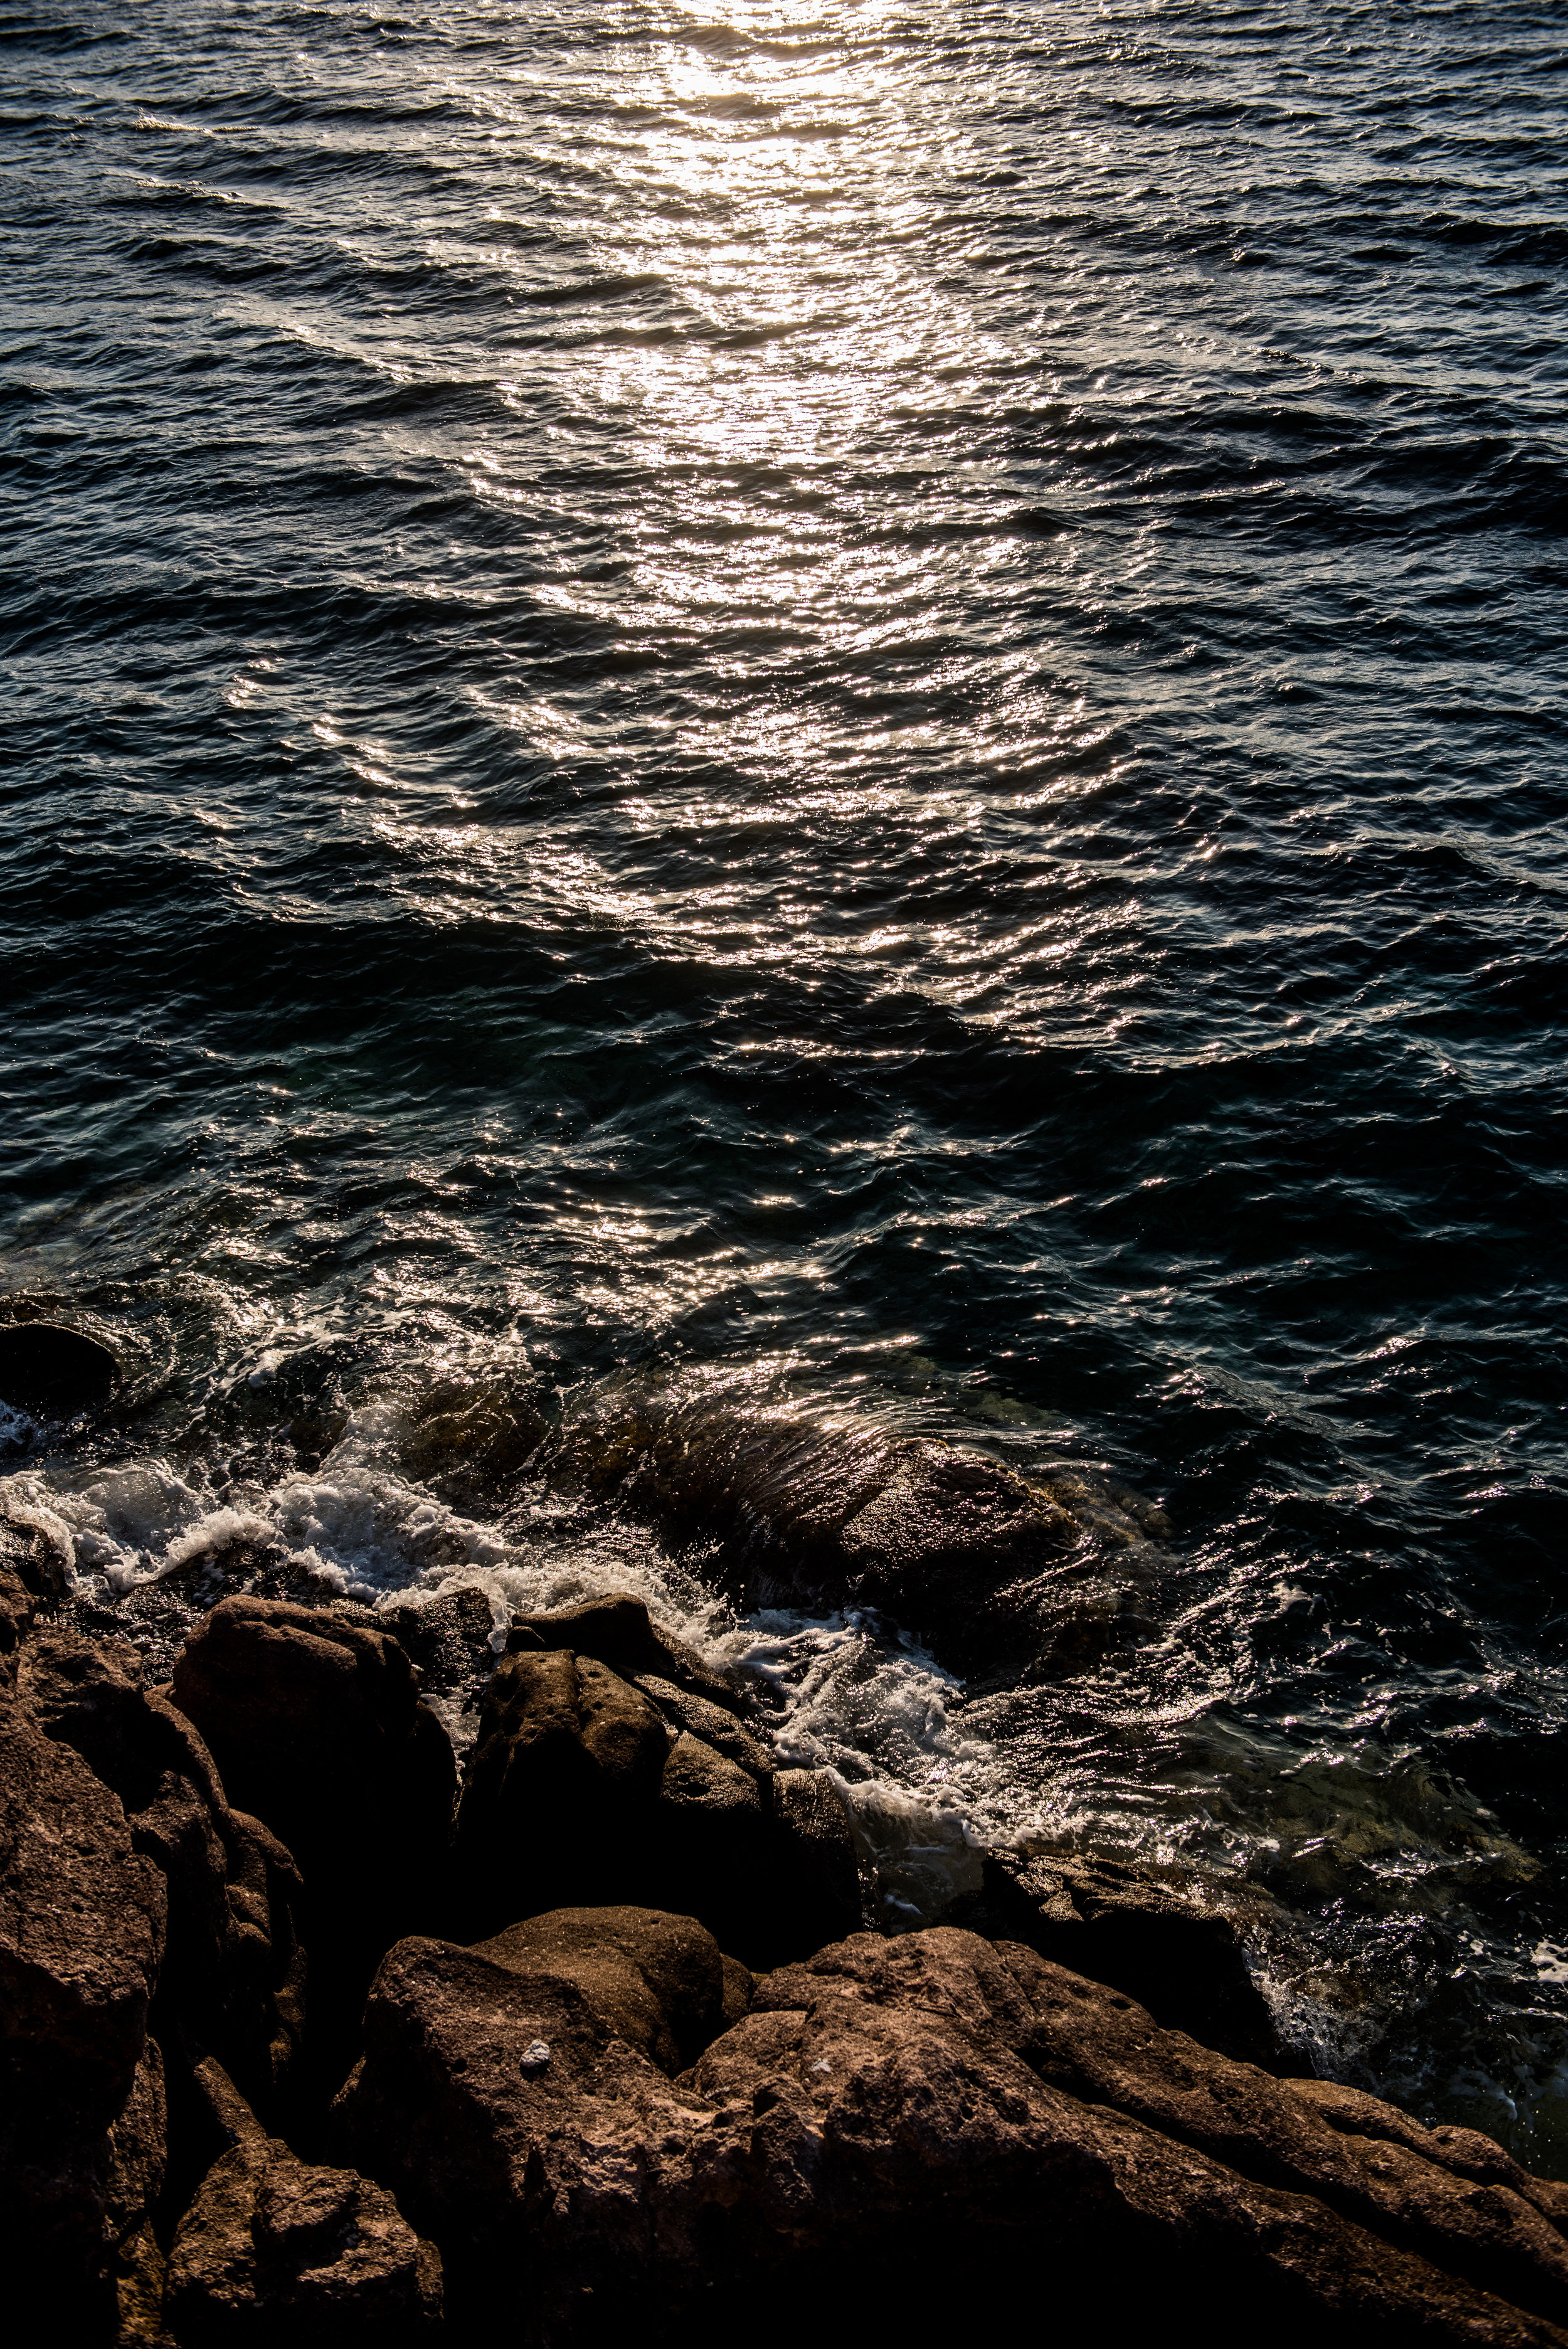 The sun sets on the Aegean Sea outside of Skala port